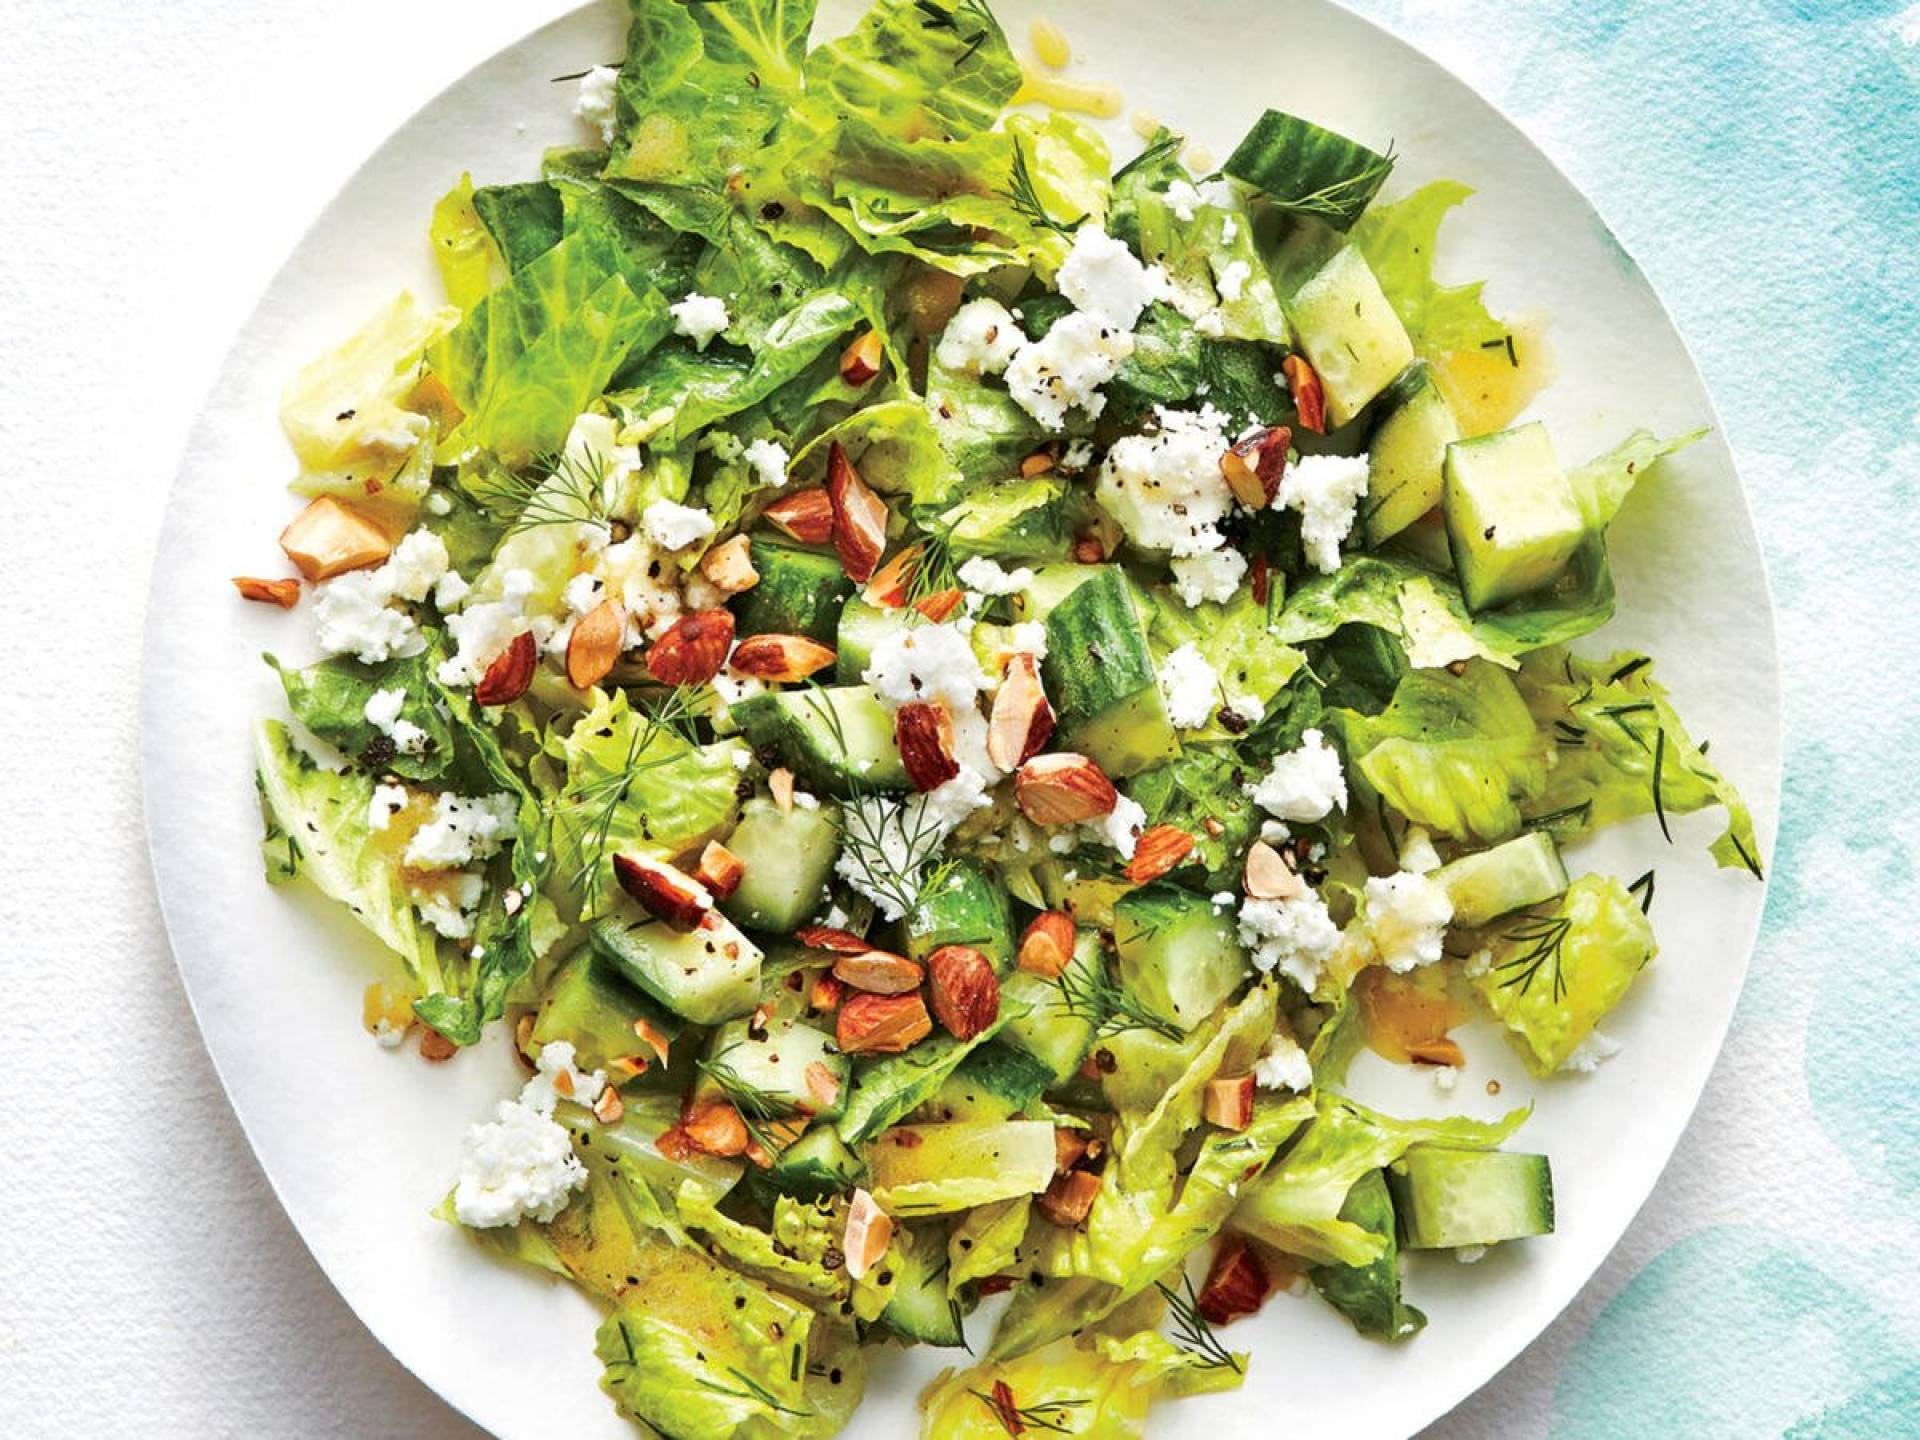 Crunchy Romaine Salad with Chicken